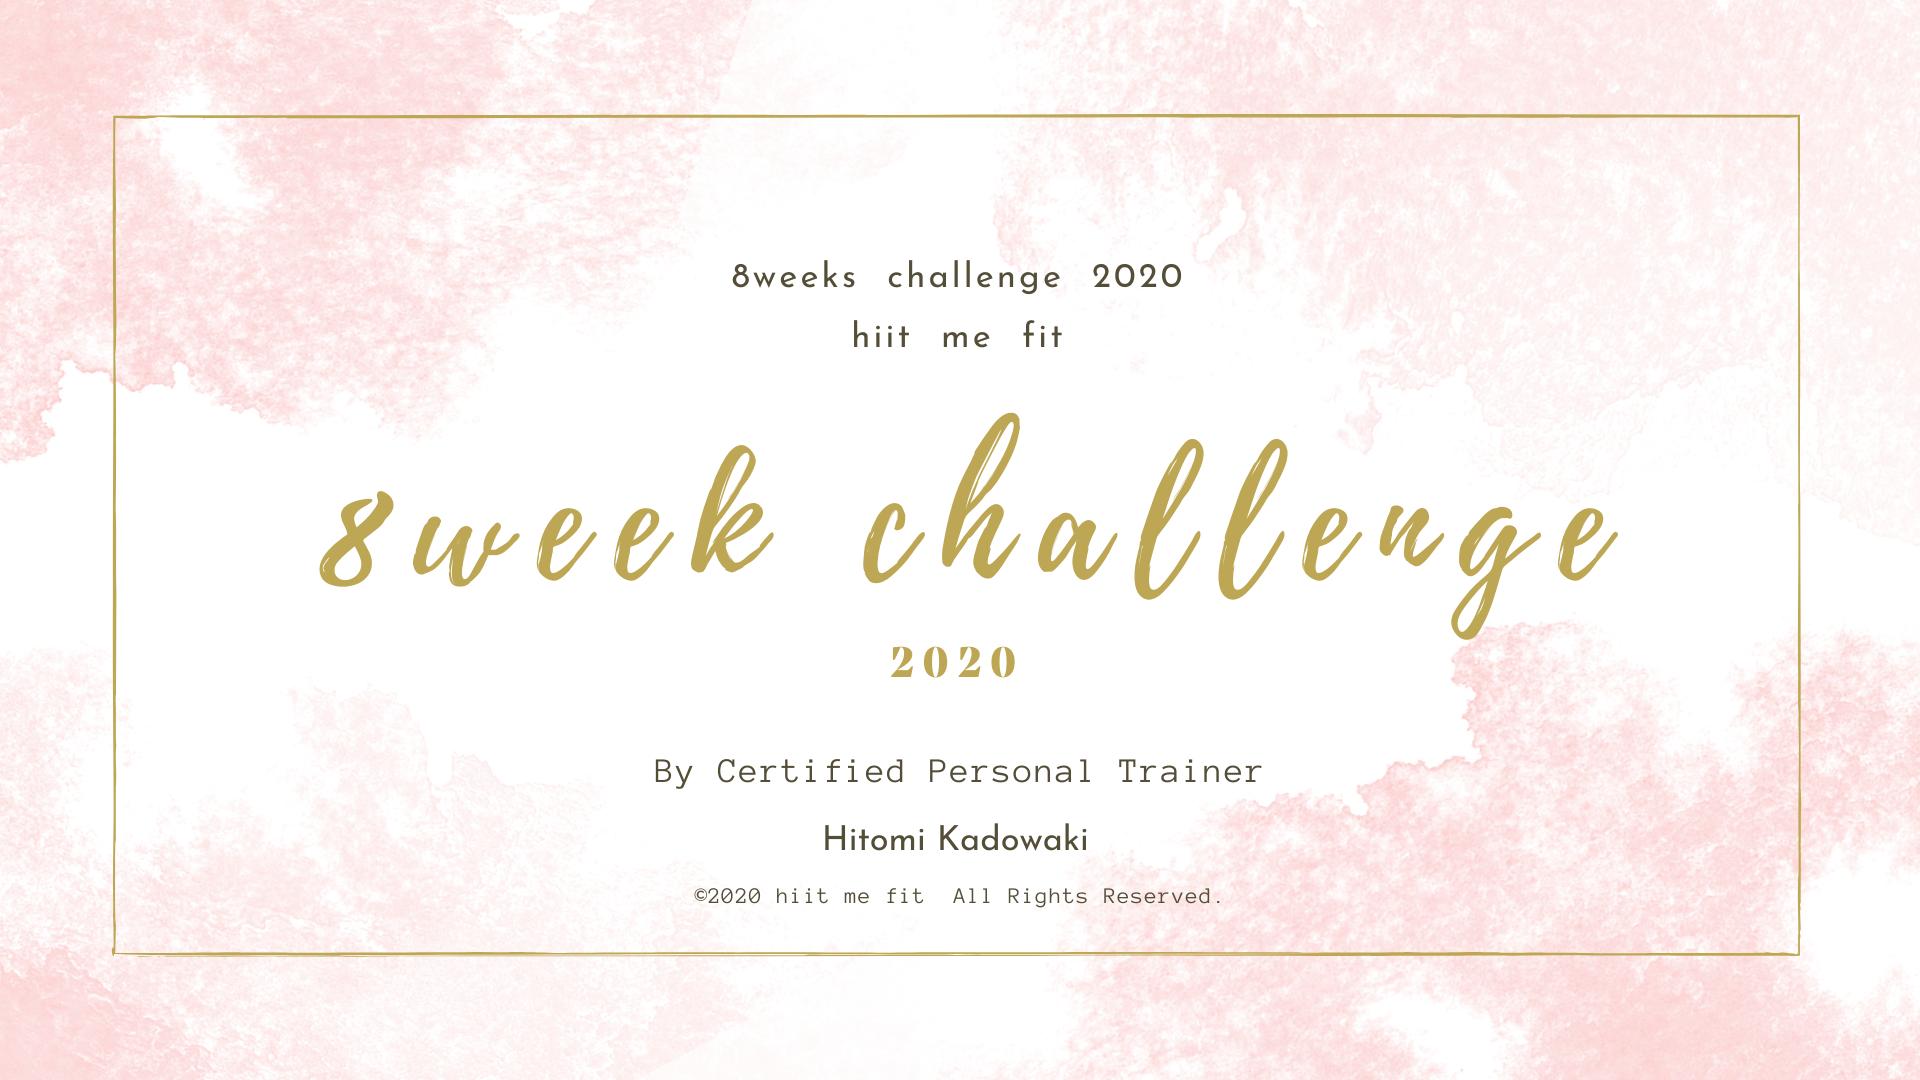 8weeks challenge 2020